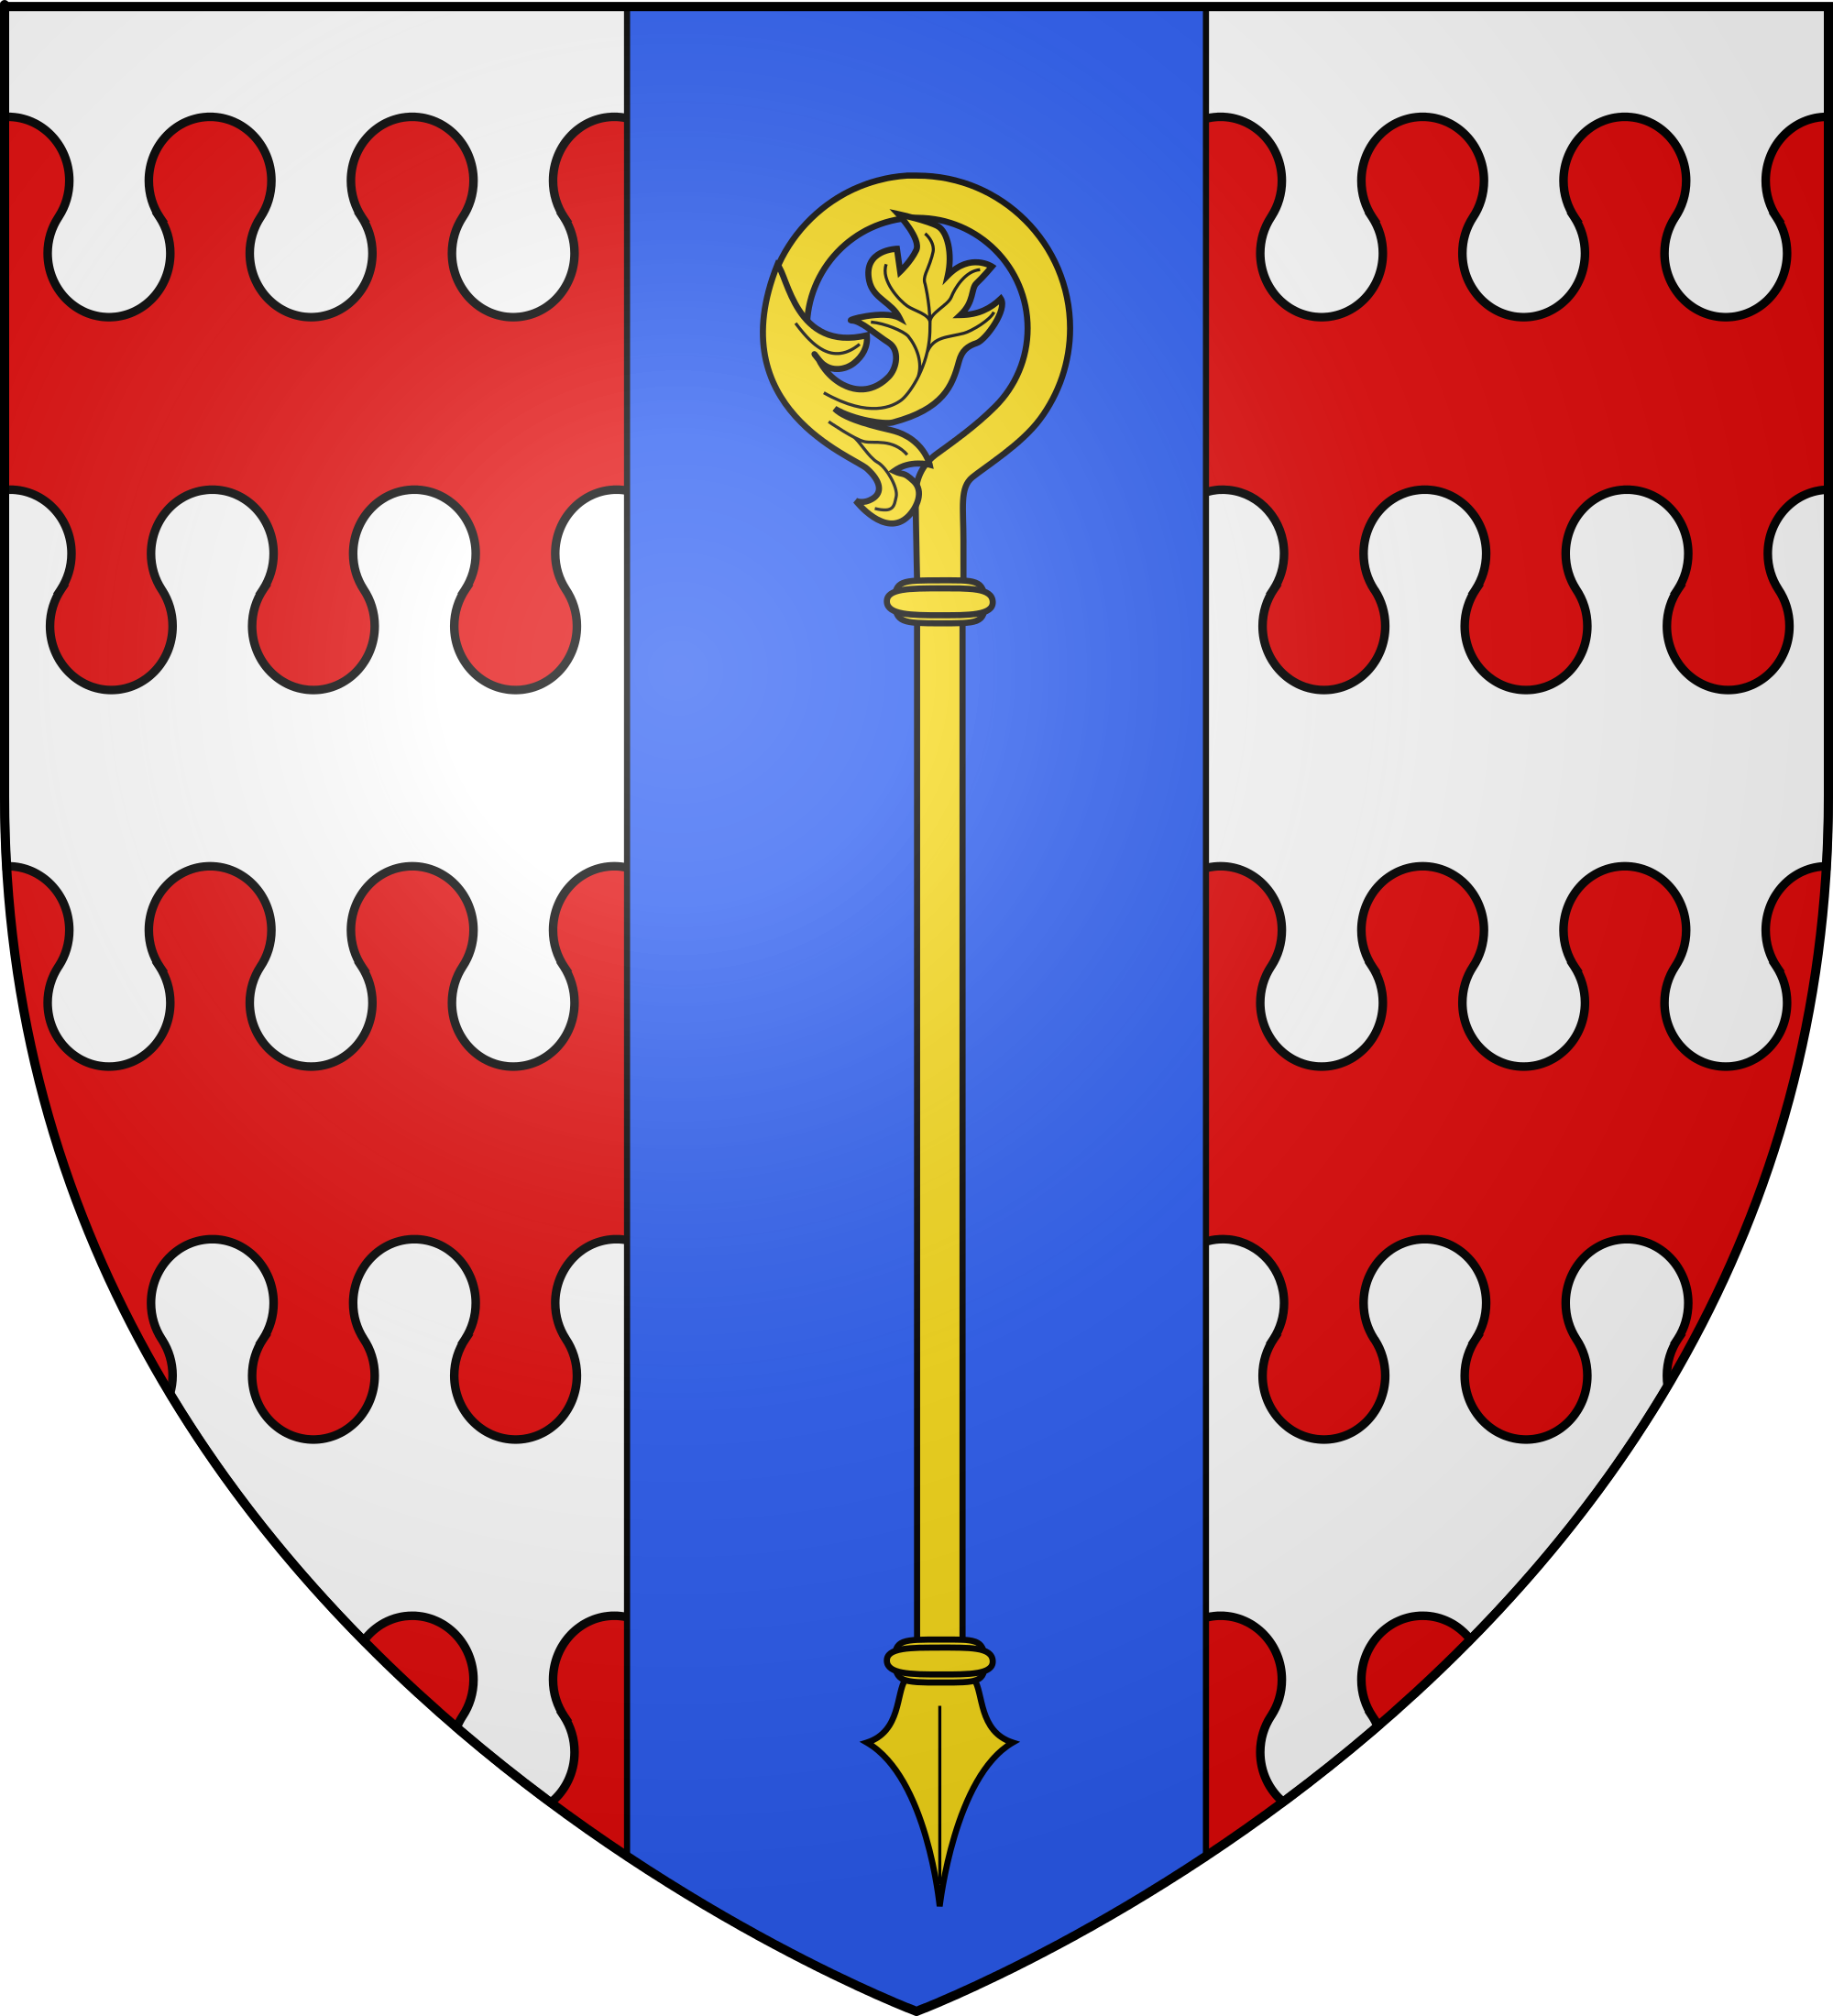 File:Blason ville fr Montigny (Loiret).svg.